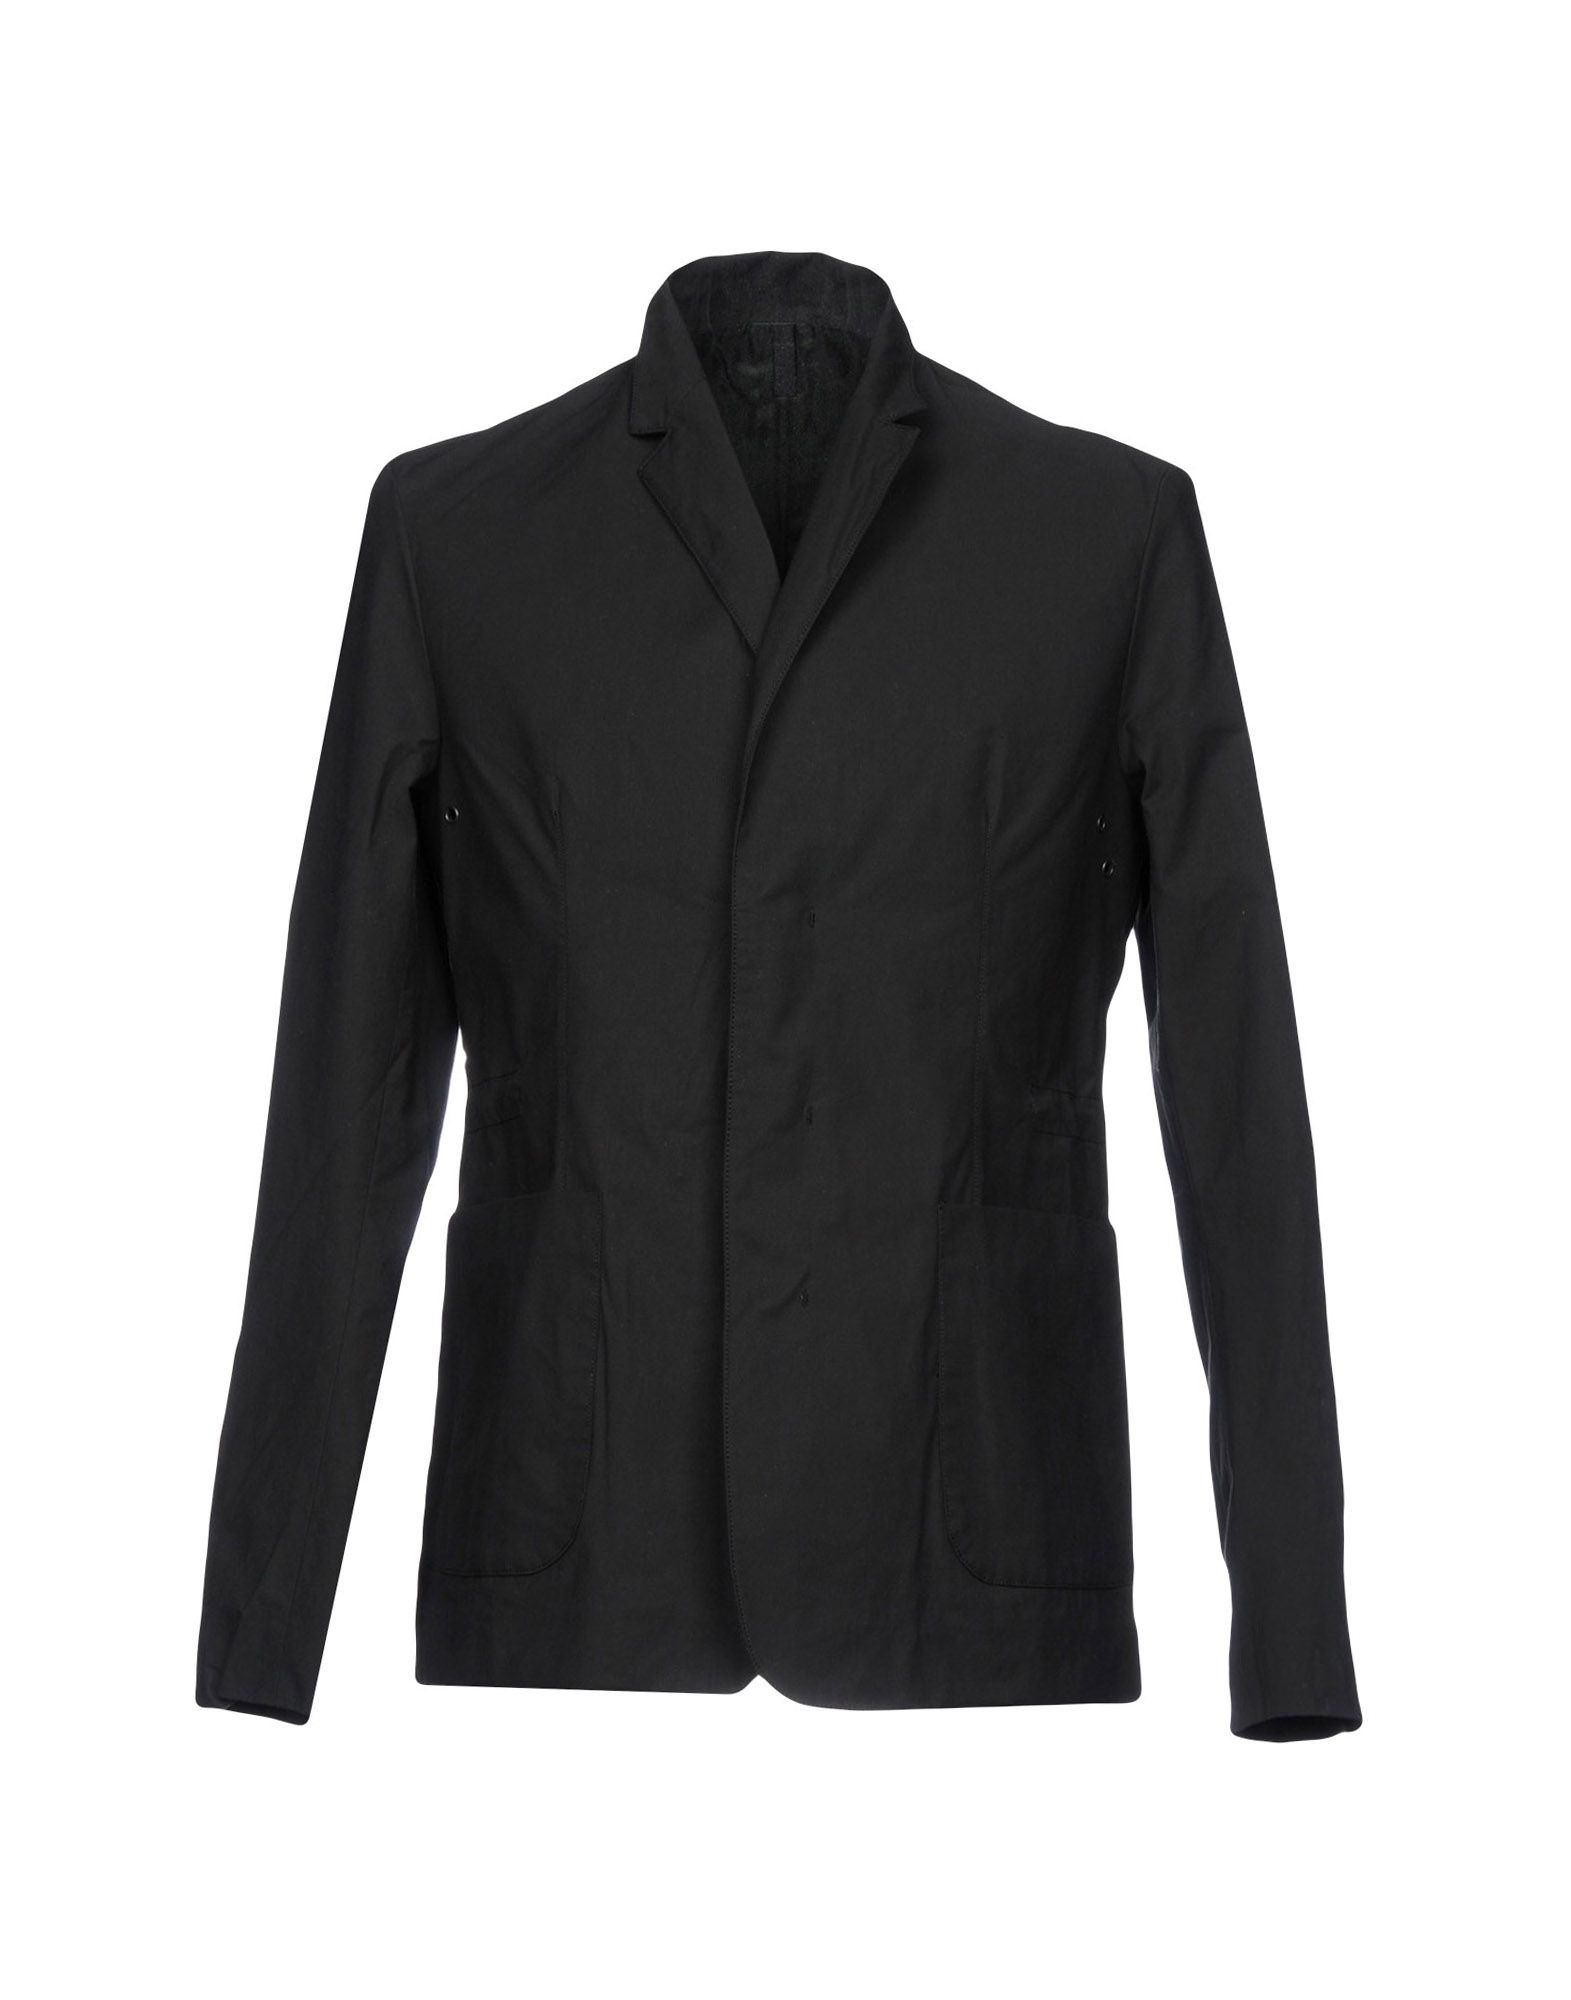 PLAC Blazer in Black